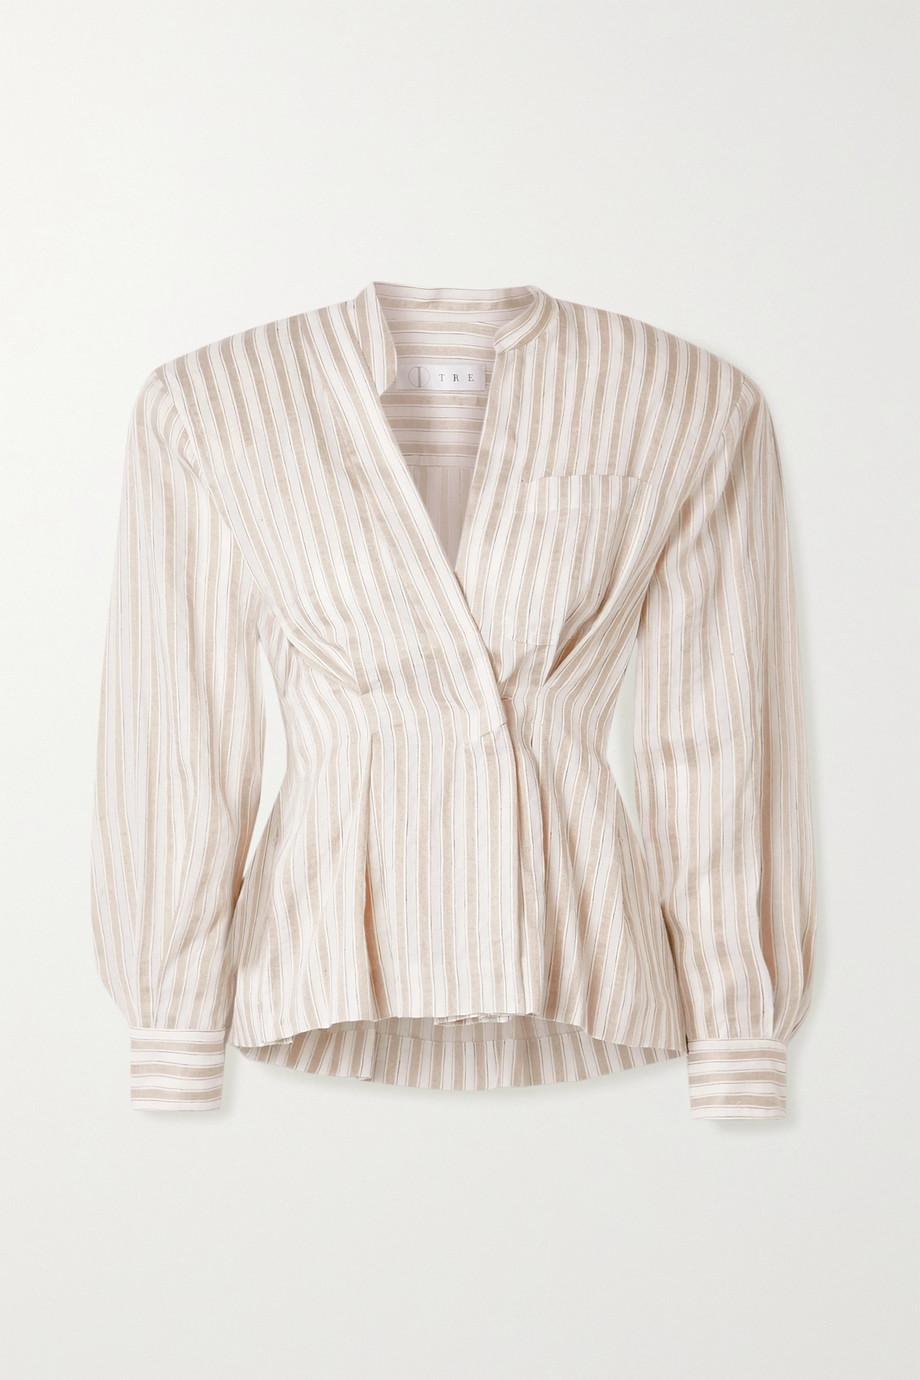 TRE by Natalie Ratabesi Striped cotton and linen-blend voile blouse